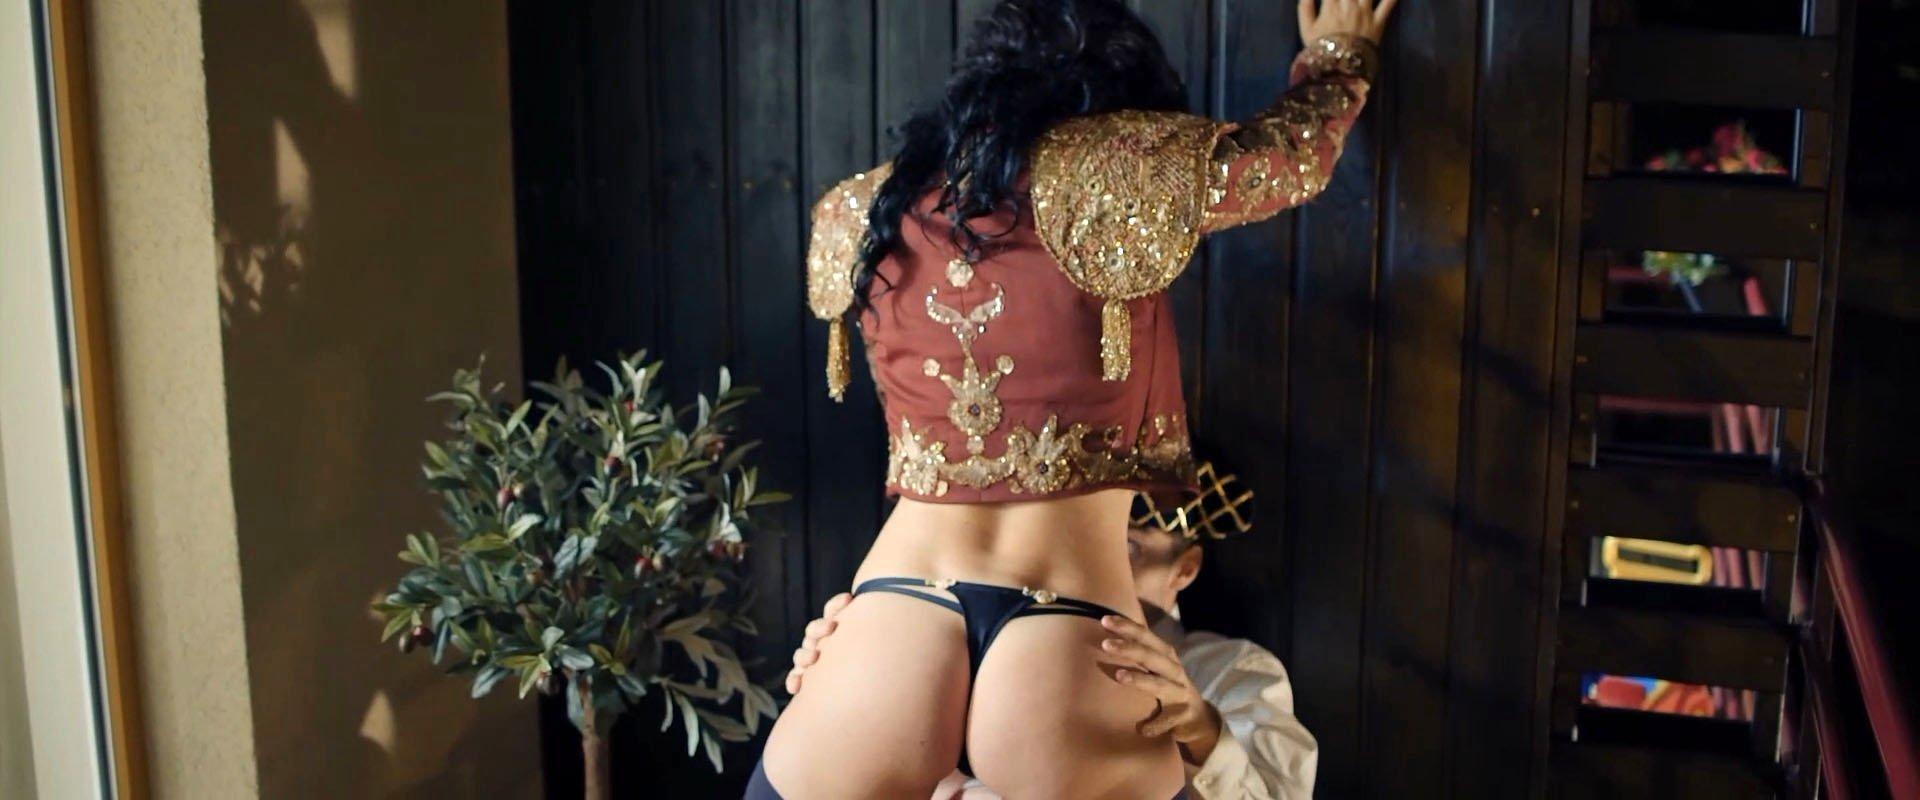 Dasha Astafeva nude - Swingeri (2018)